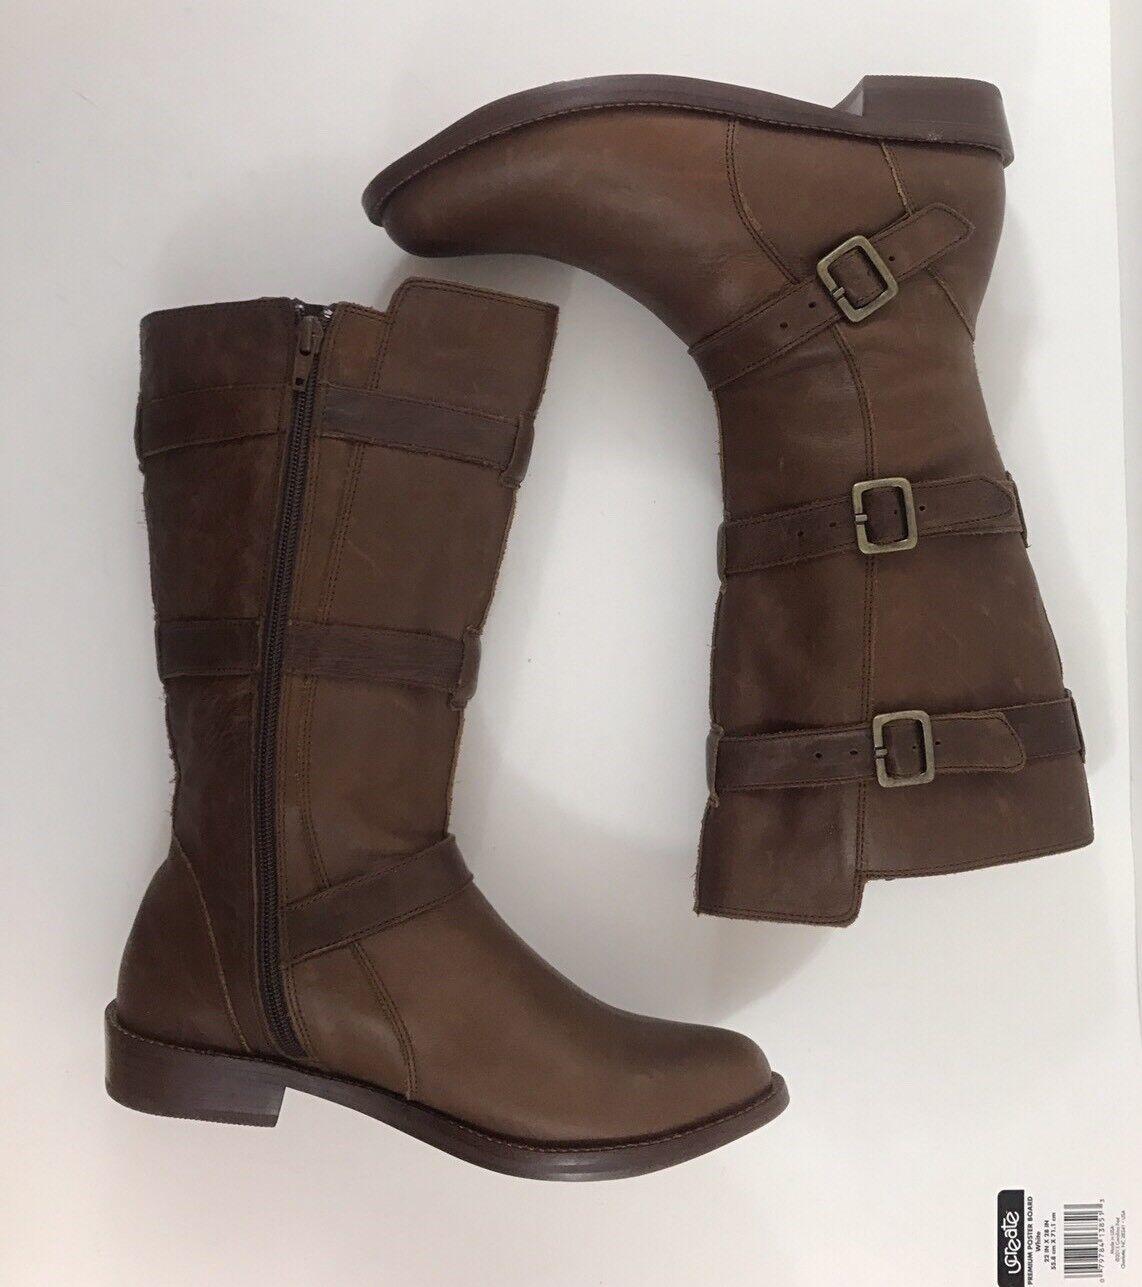 Anthropologie Gee Wawa Marronee Leather Mid-Calf stivali Dimensione 7M  328  13